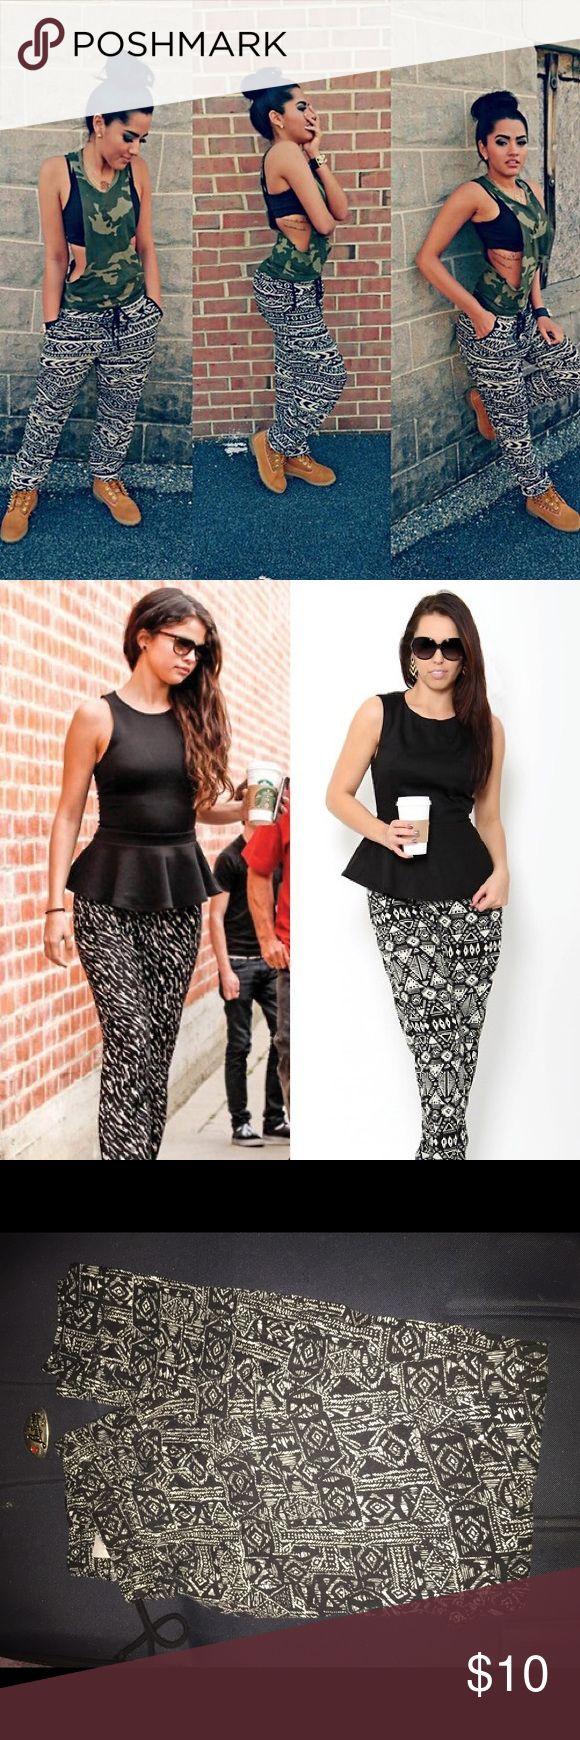 Black and White printed tribal pants (ONE DAY SALE ✖️Cute/Trendy ✖️ Size: Medium ✖️ Like New ✖️Can dress up or down Fashion Nova Pants